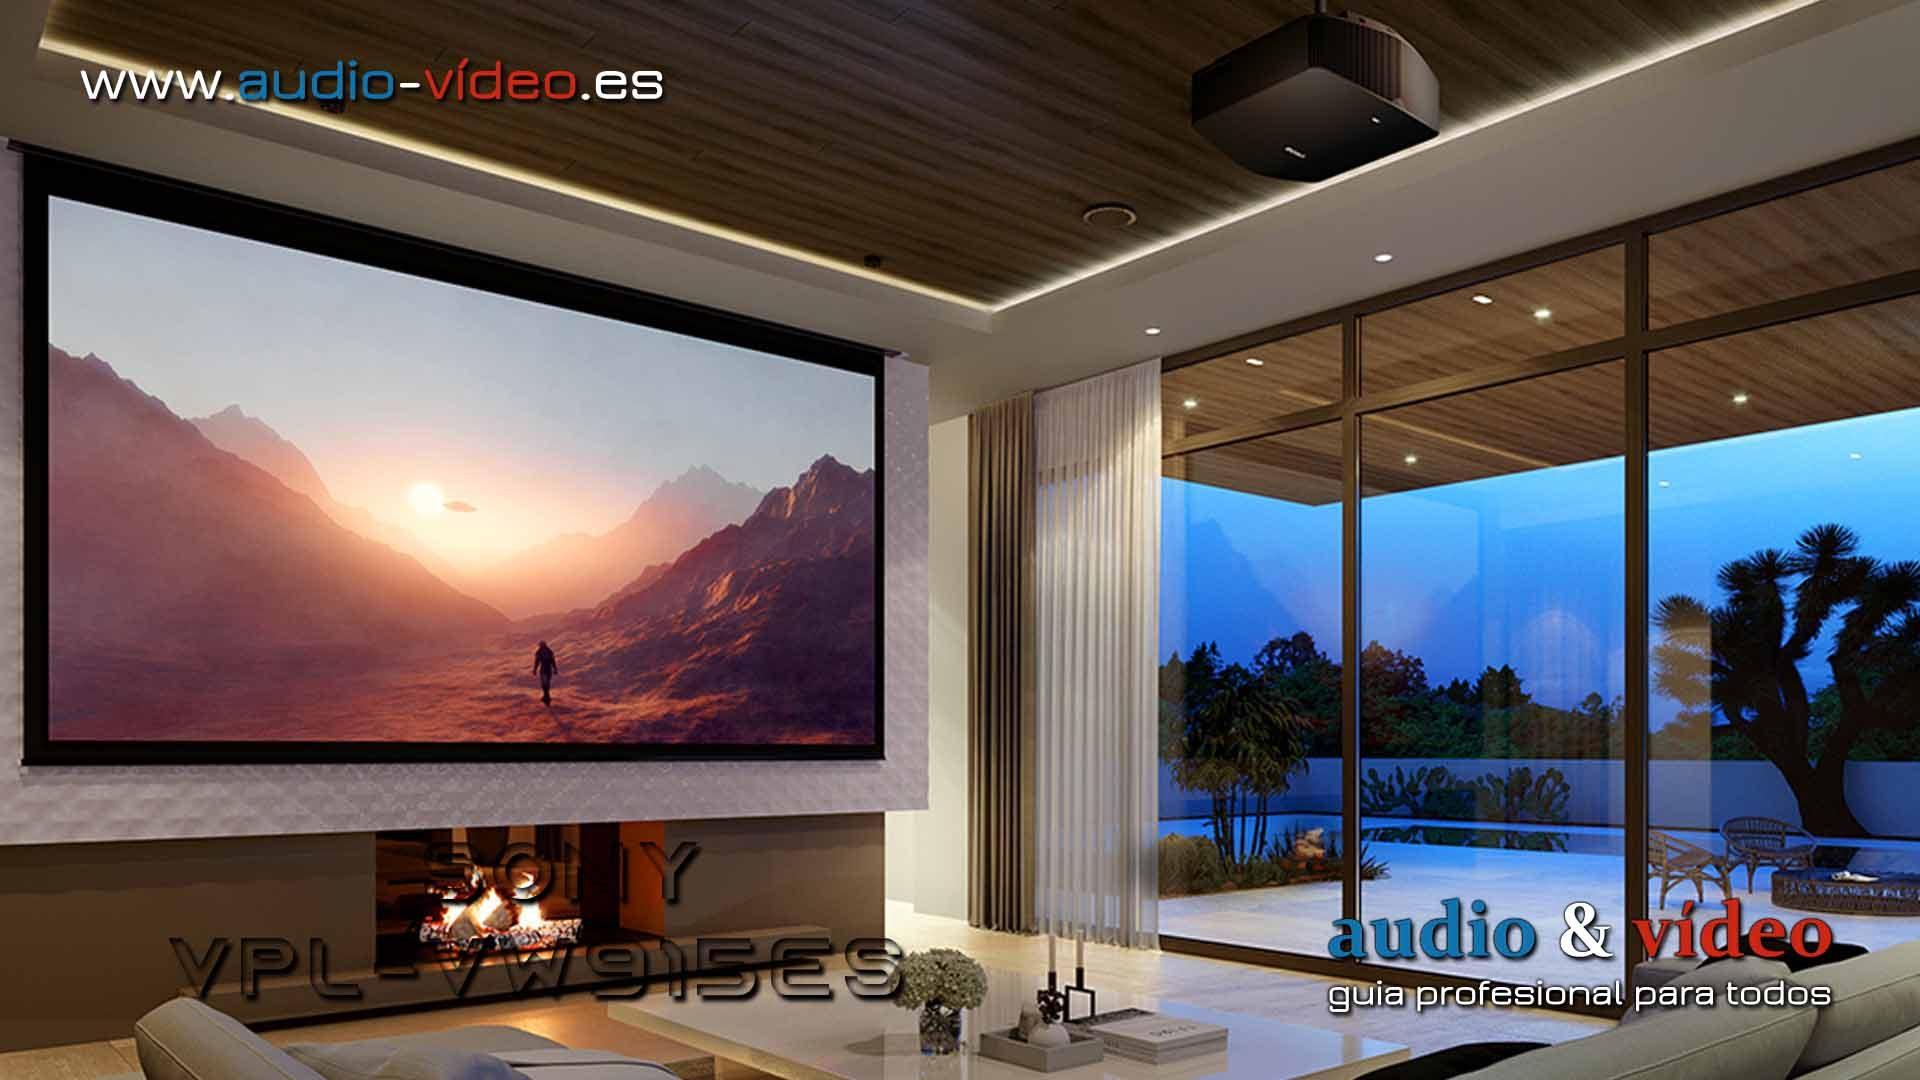 Proyector 4K : Sony VPL-VW915ES – Dual Contrast Control